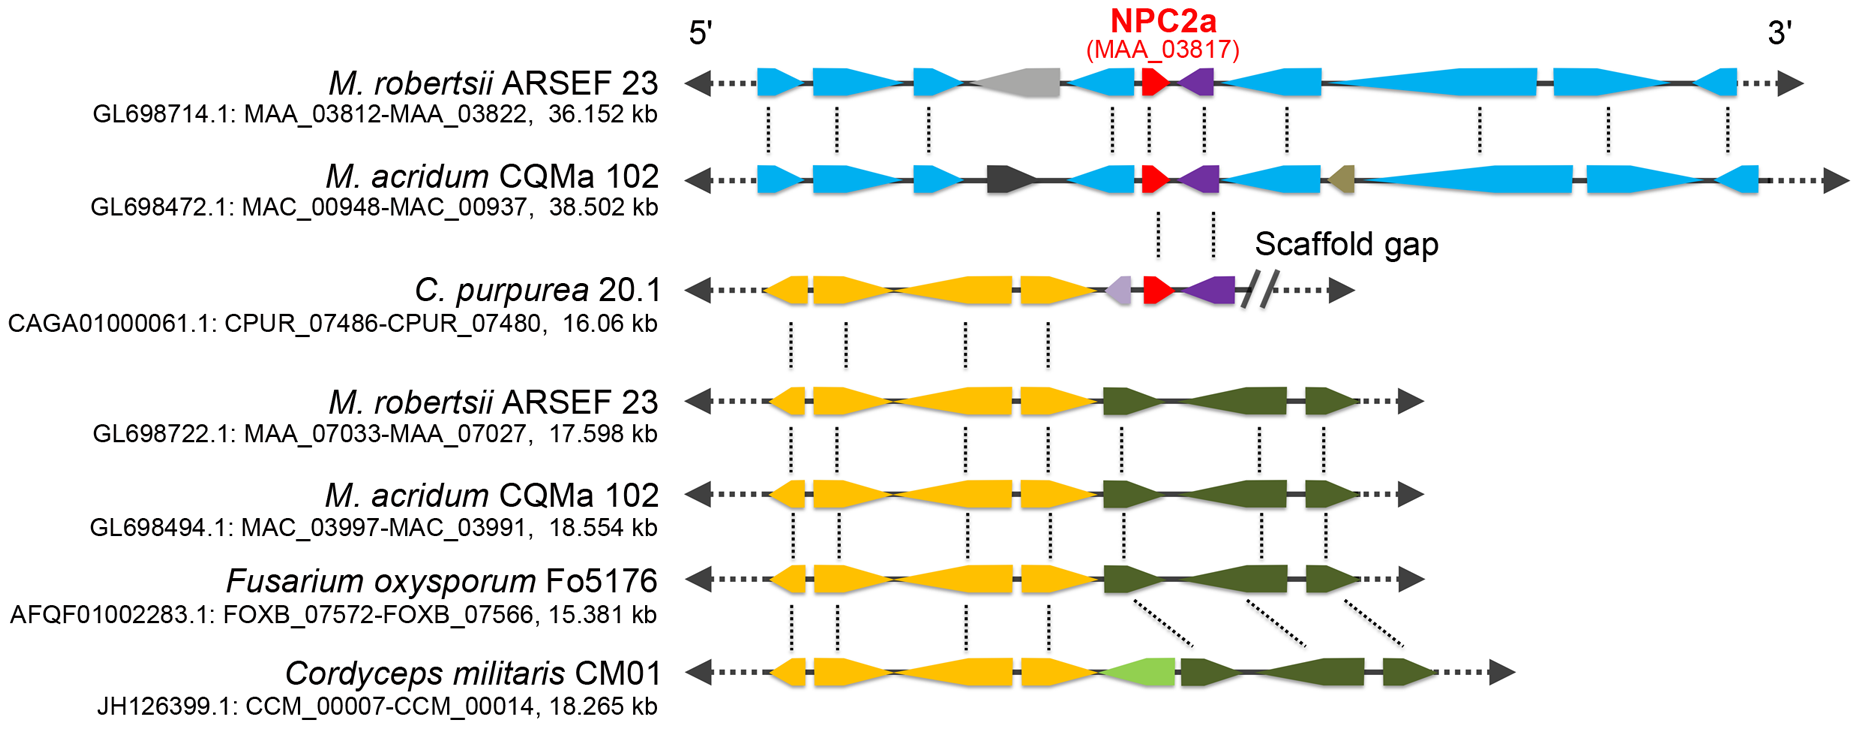 Genomic context of the gene <i>npc2a</i> in <i>M. robertsii</i>, <i>M. acridum</i>, <i>C. purpurea</i>, and 16 other fungi (represented by <i>Fusarium oxysporum</i> and <i>Cordyceps militaris</i>).